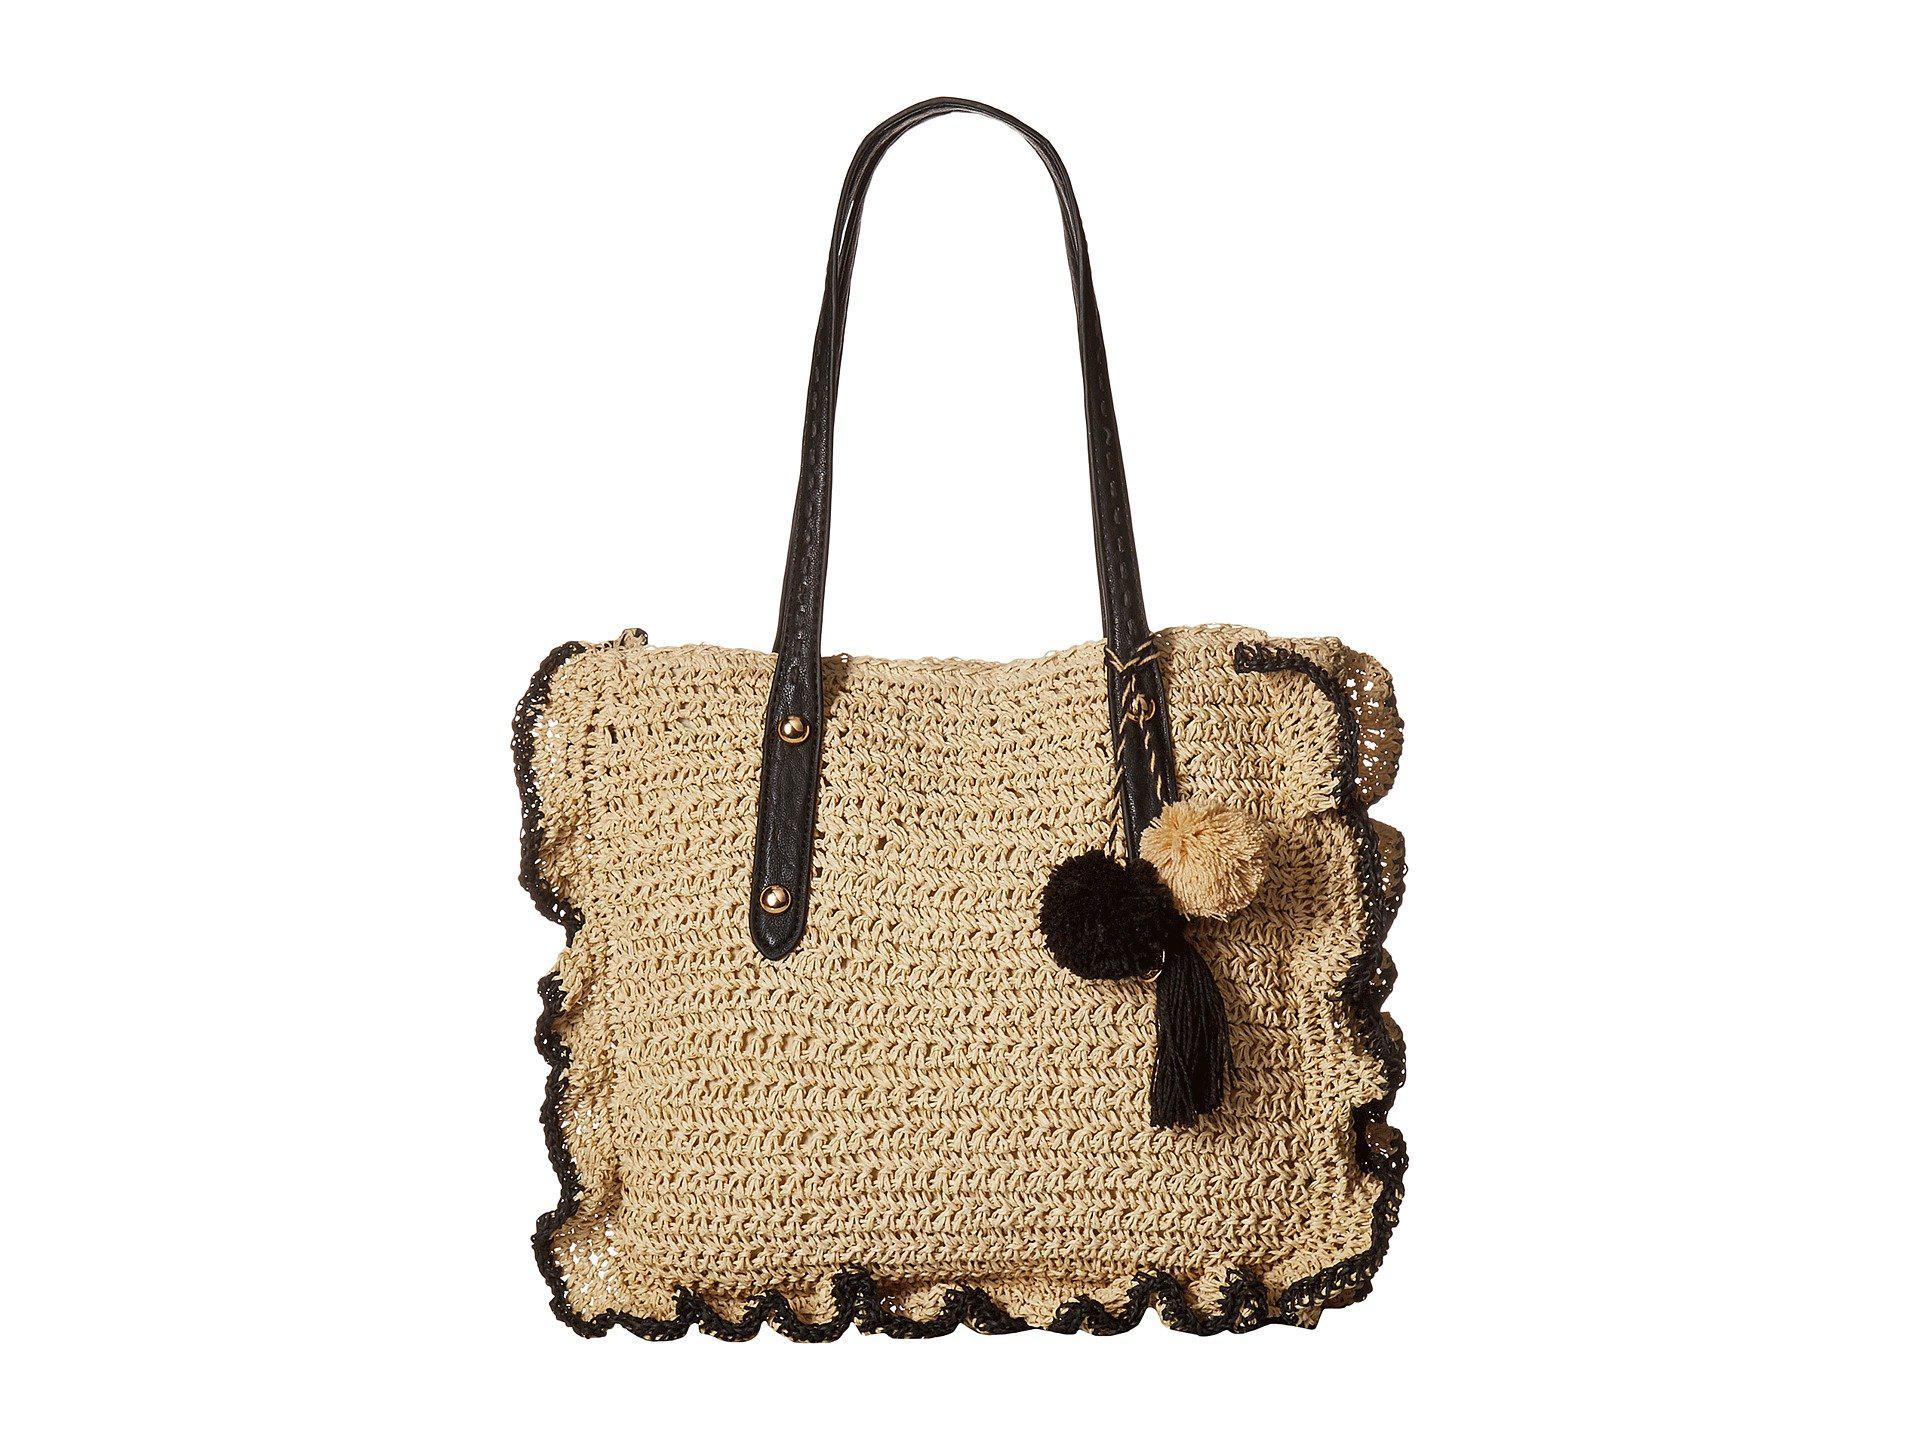 Jessica Simpson Kalie Straw (Natural/Black) Handbags WDw5aV